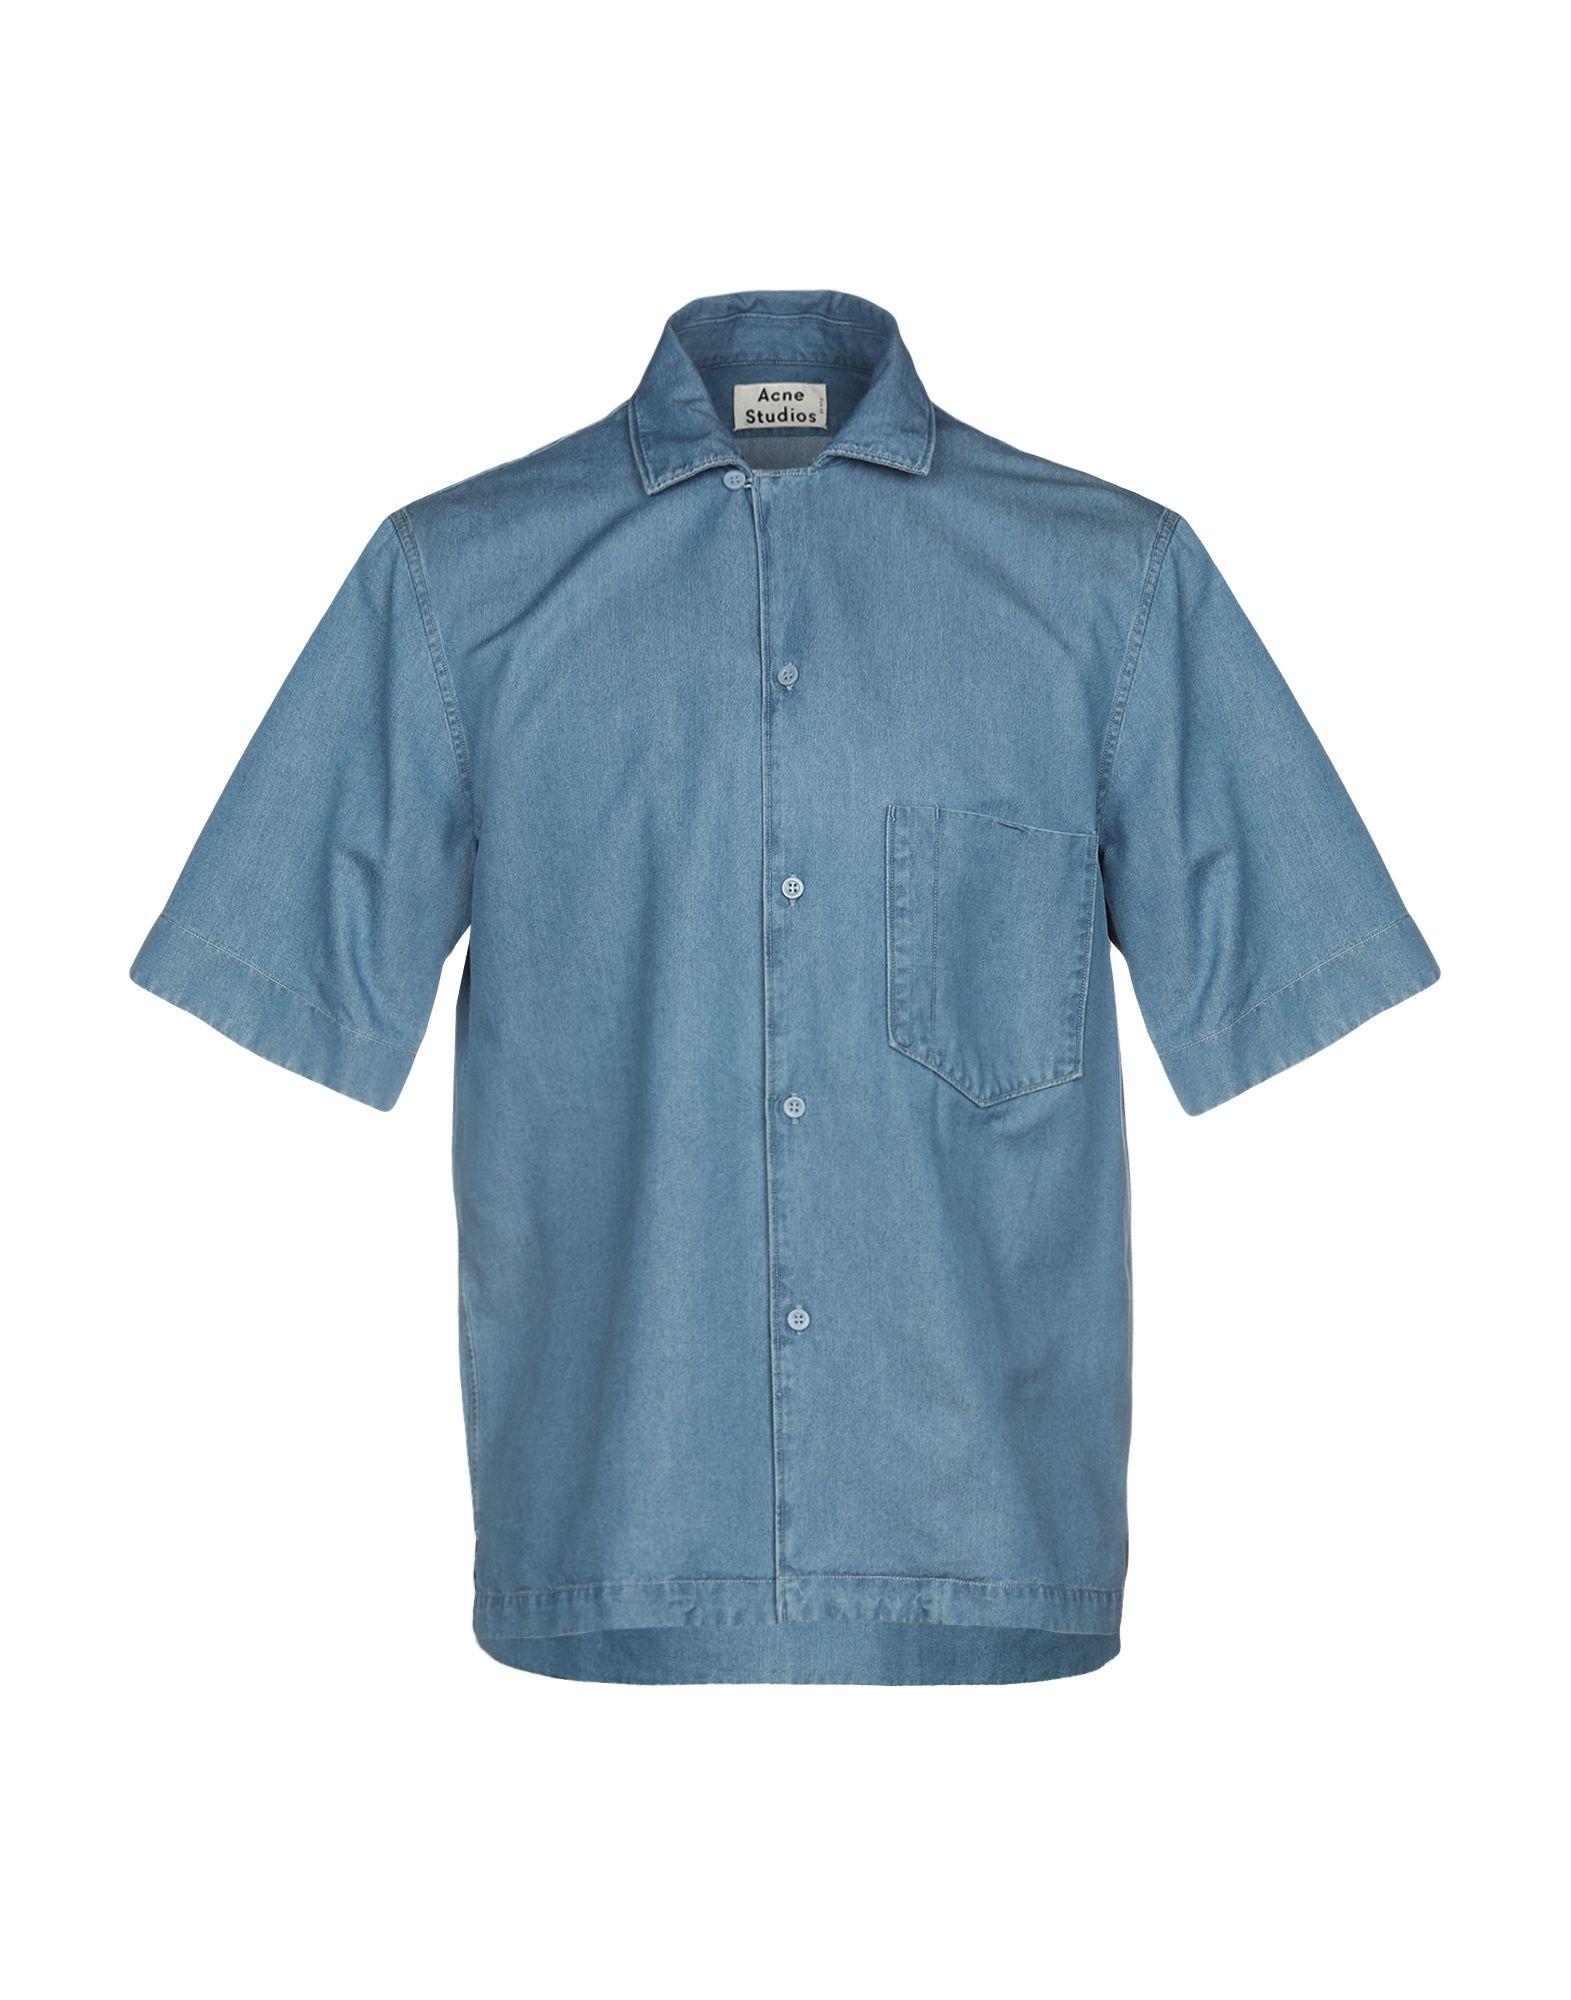 ACNE STUDIOS Джинсовая рубашка